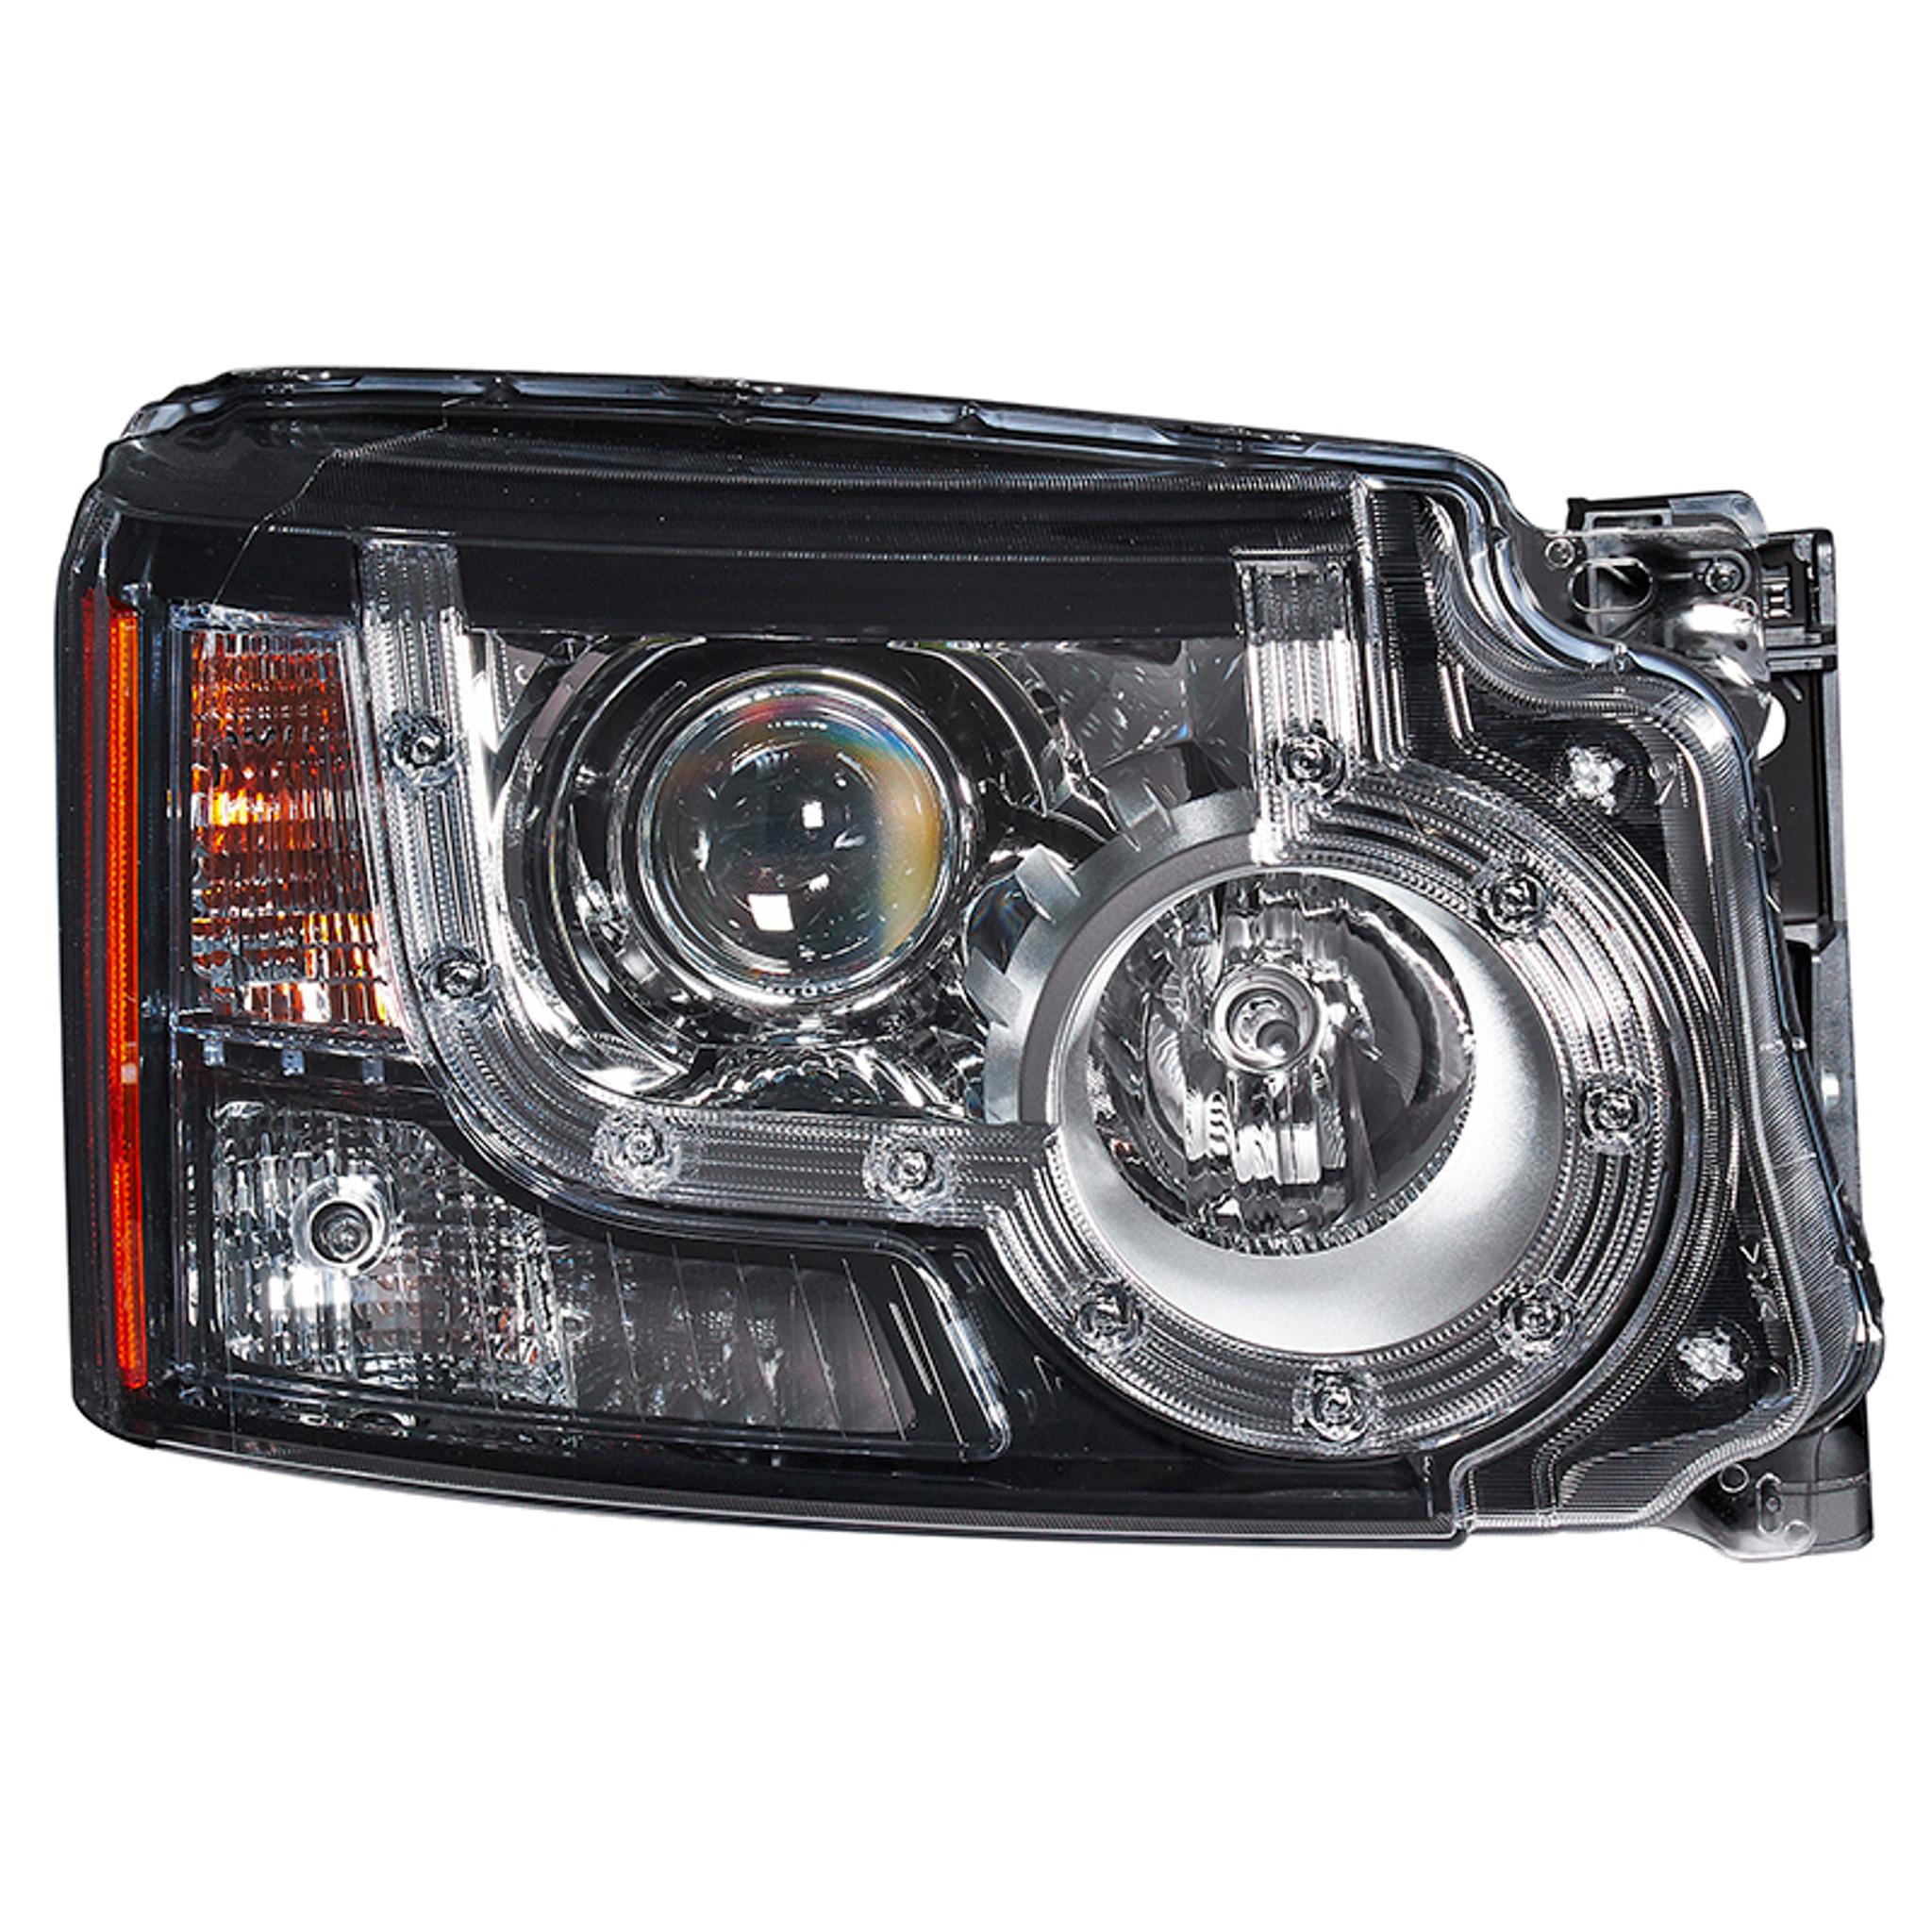 Land Rover Discovery 3 4 Valeo Headlights Meduza Design Ltd